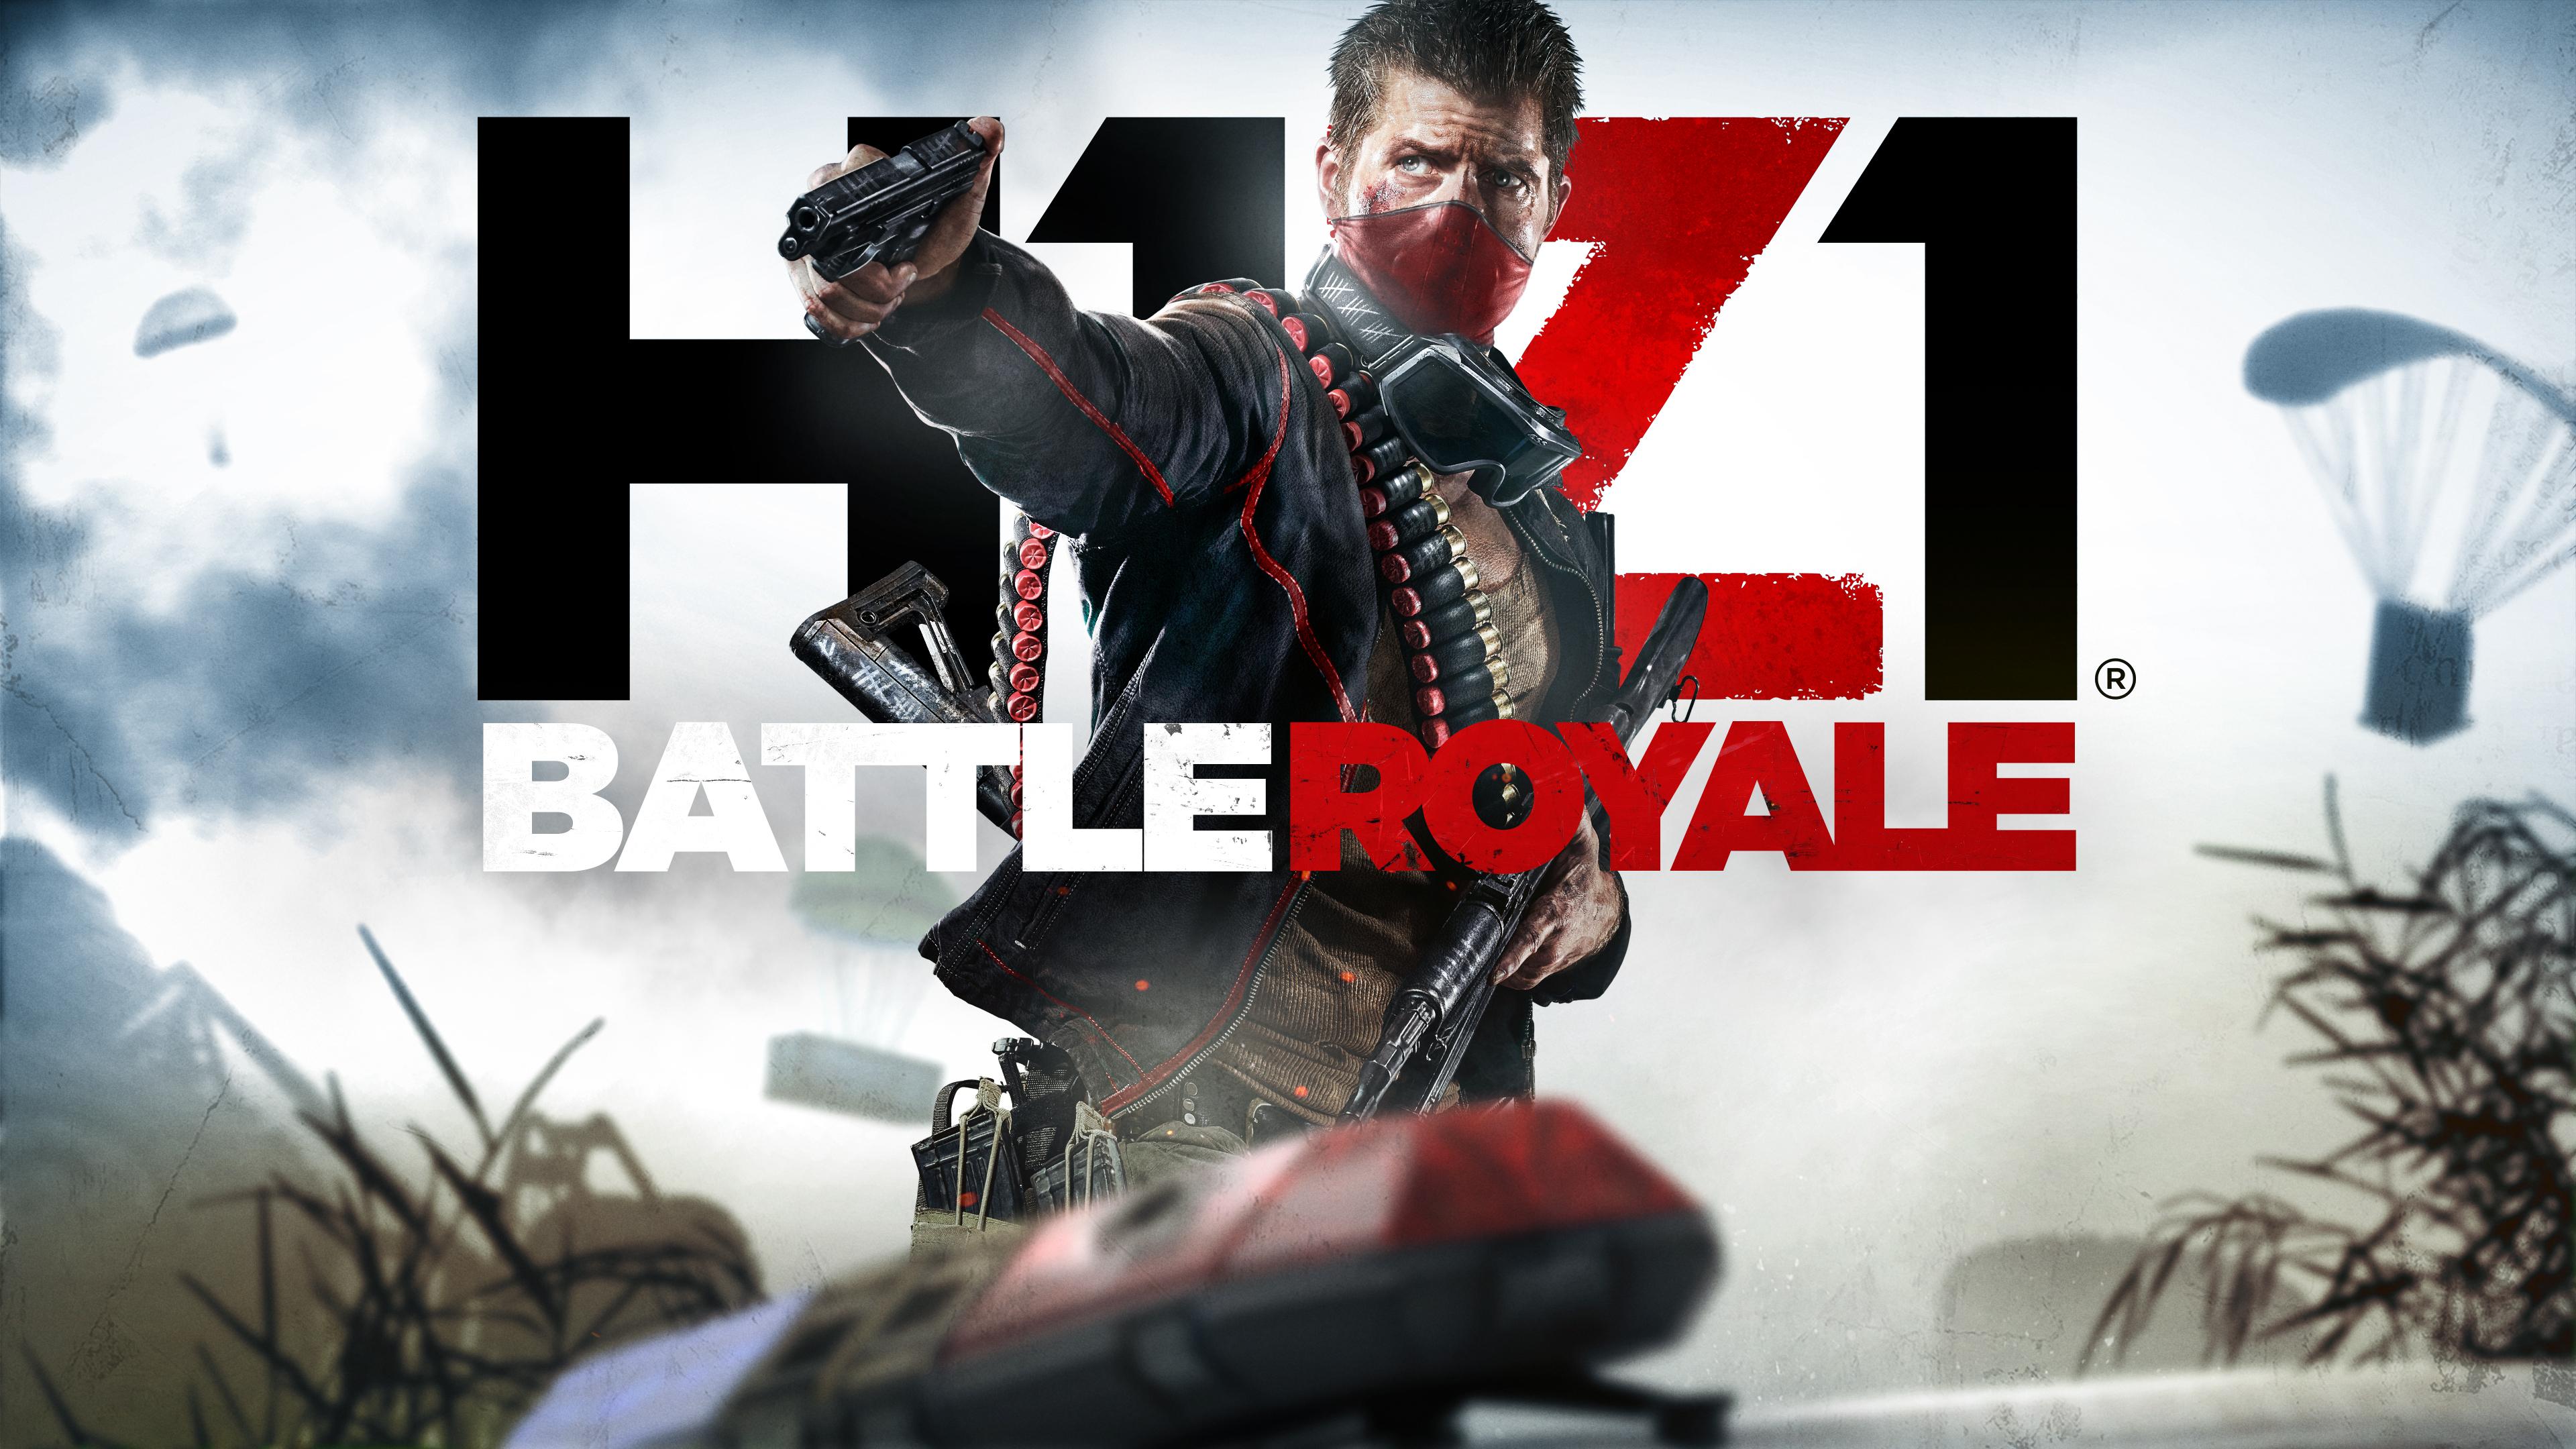 battle royale h1z1 4k, hd games, 4k wallpapers, images, backgrounds